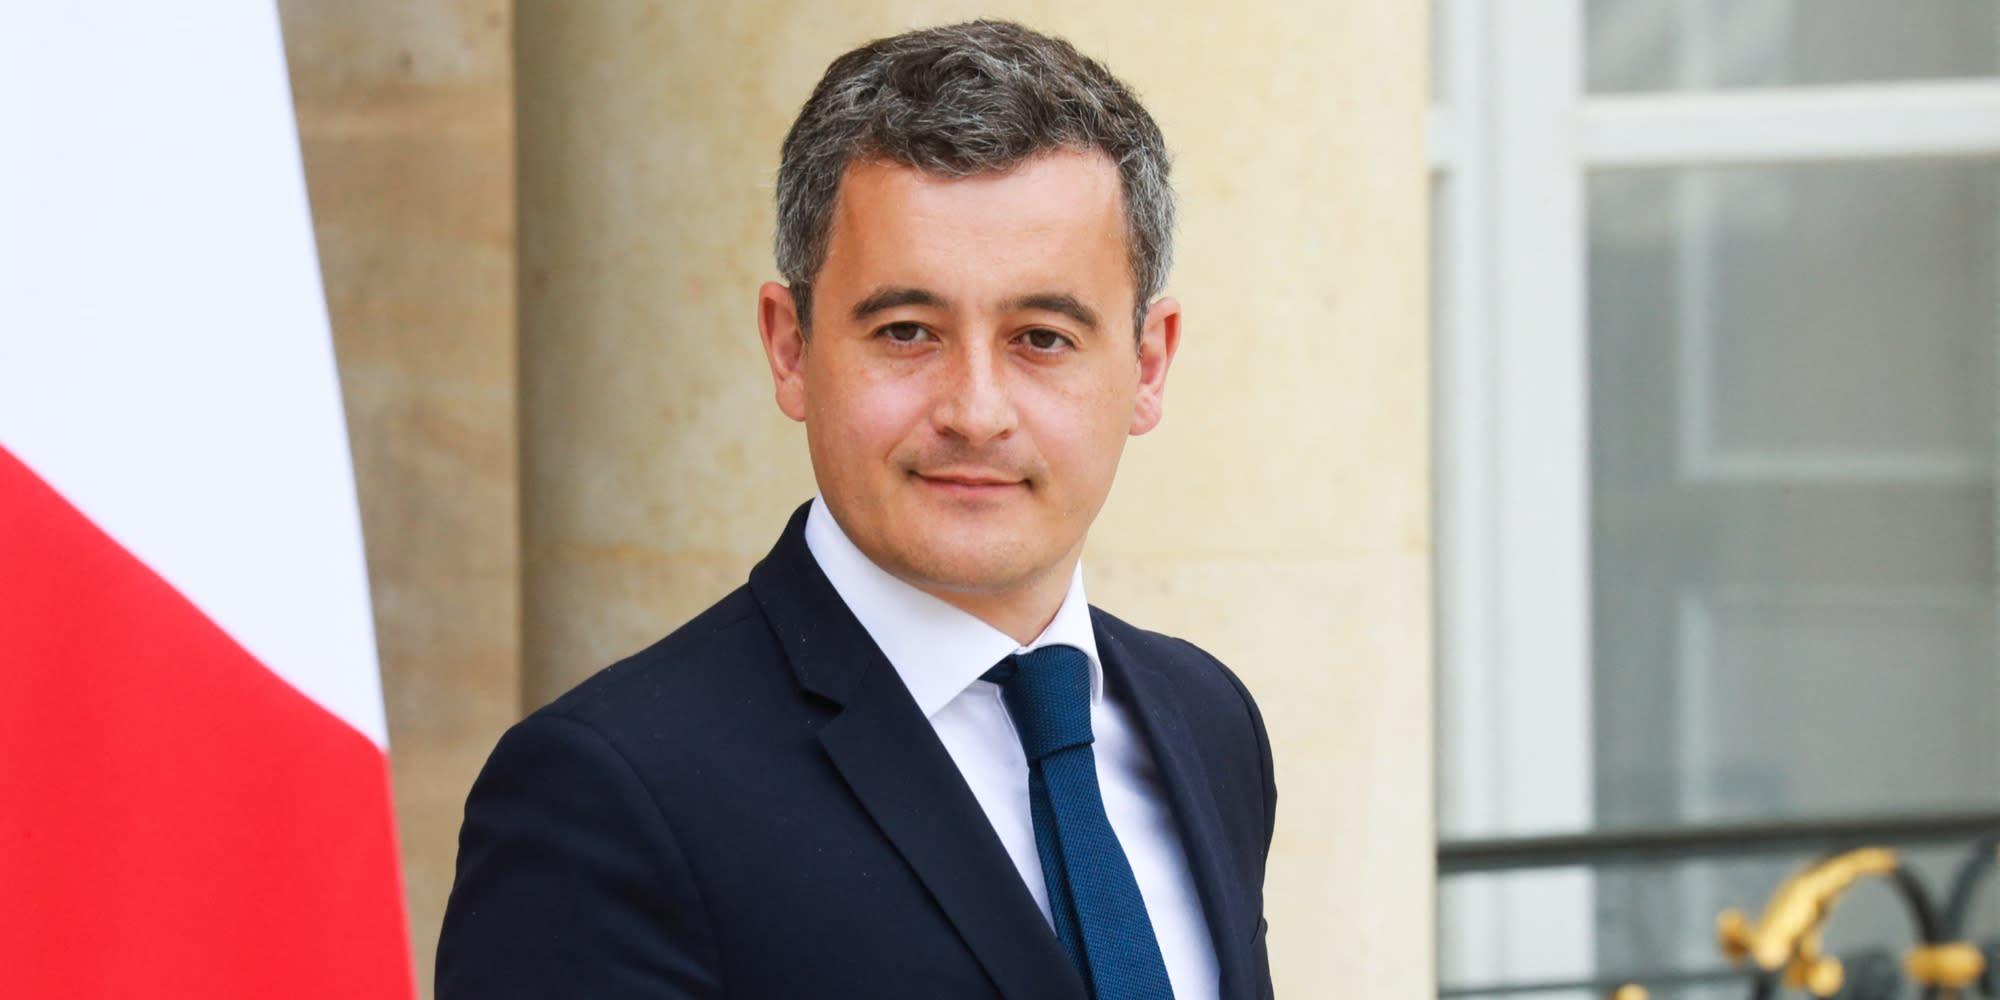 Islam radical : Gérald Darmanin annonce la dissolution de sept structures